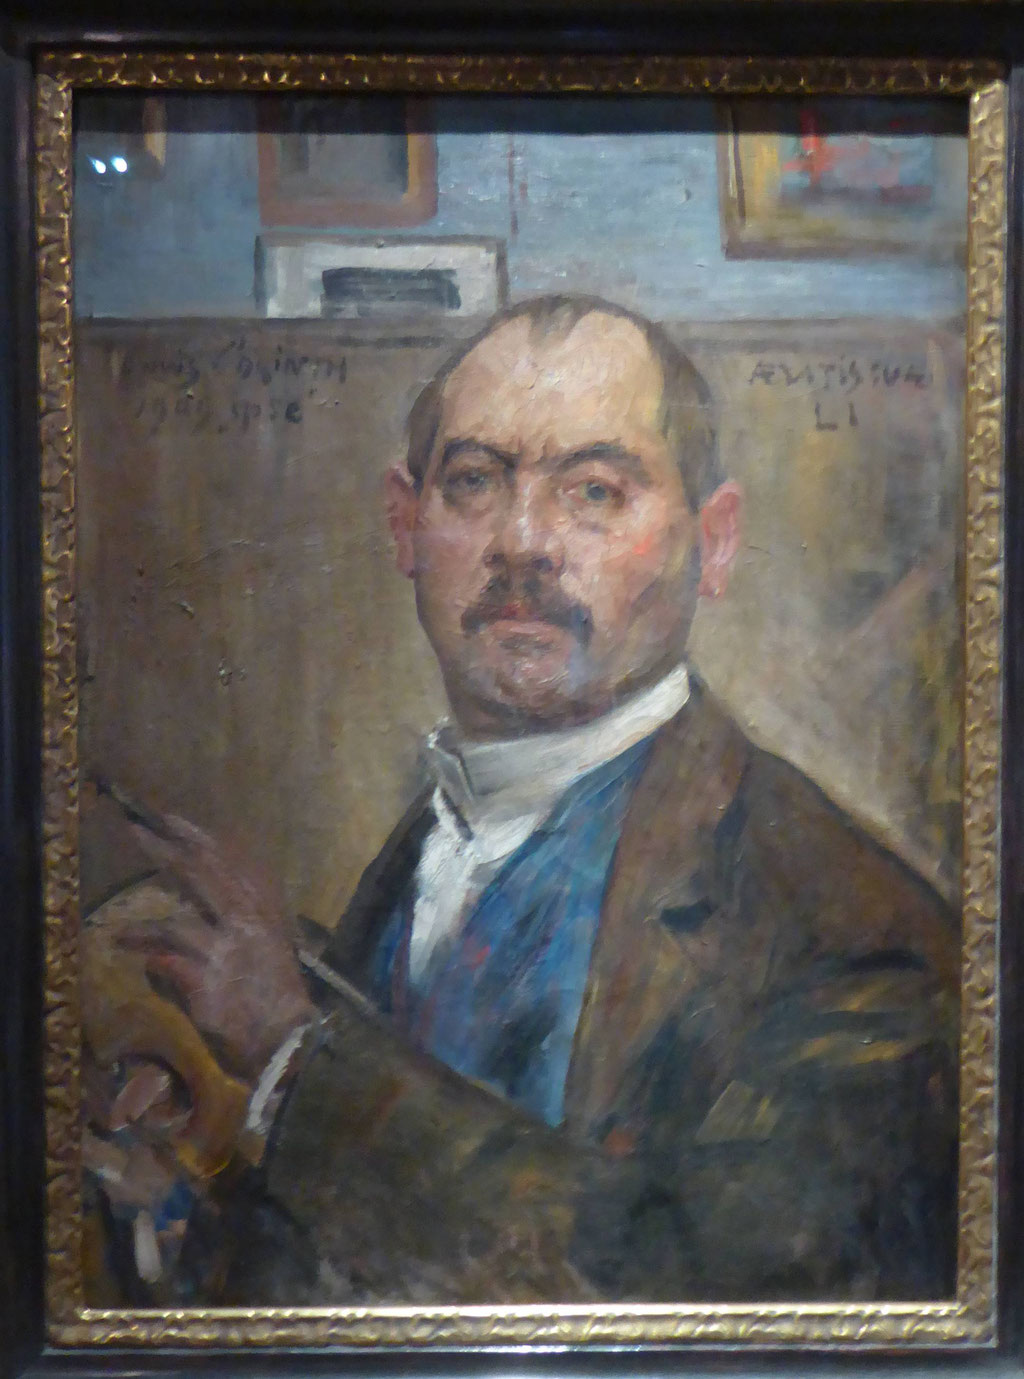 Lovis Corinth, Selbstbildnis, 1909, Museum Moritzburg, Halle